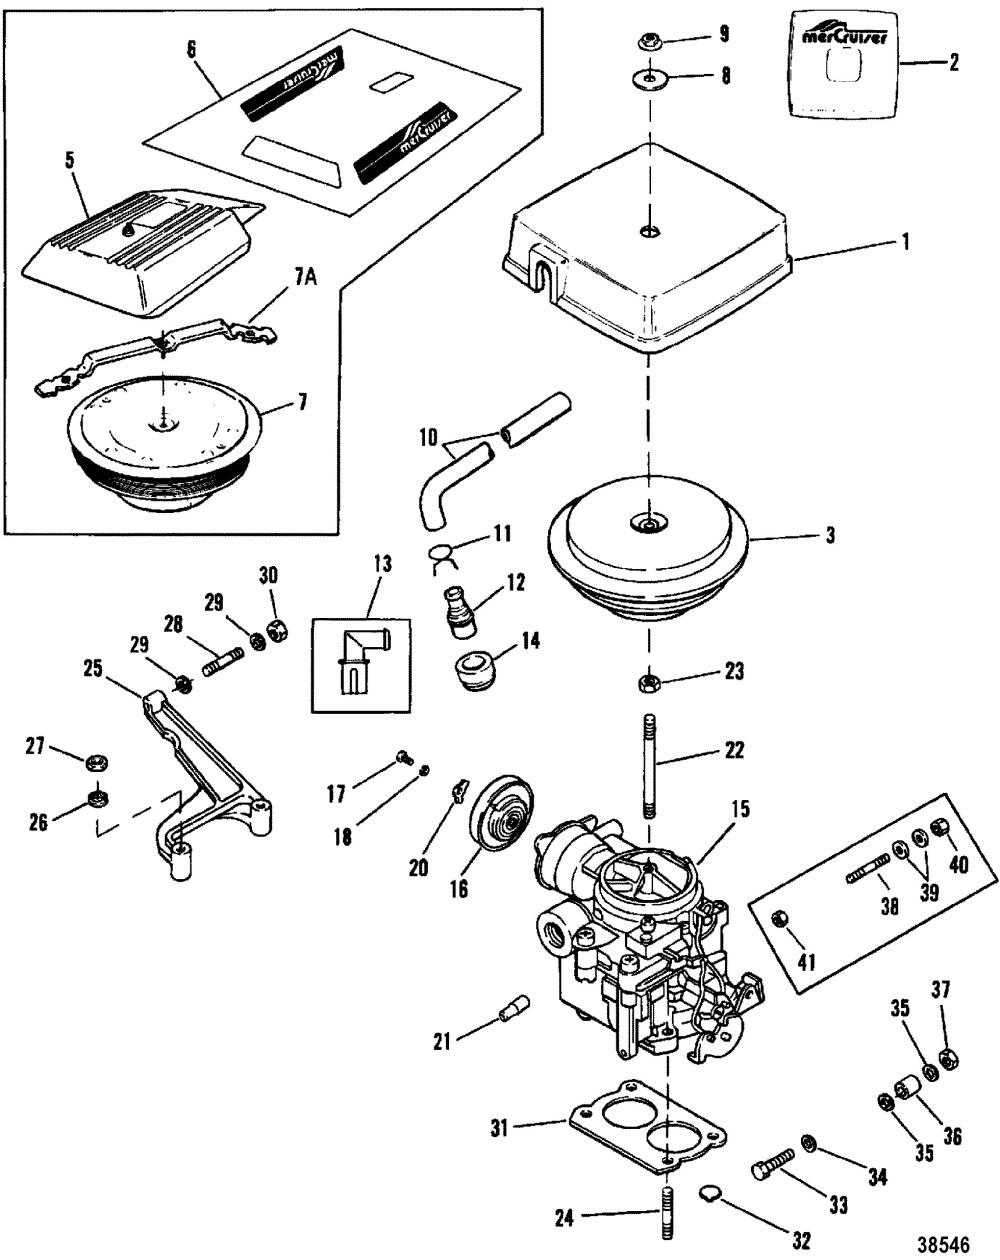 medium resolution of 350 mercruiser engine diagram carburetor throttle linkage 2 barrel for mercruiser 200 5 0l lx 260